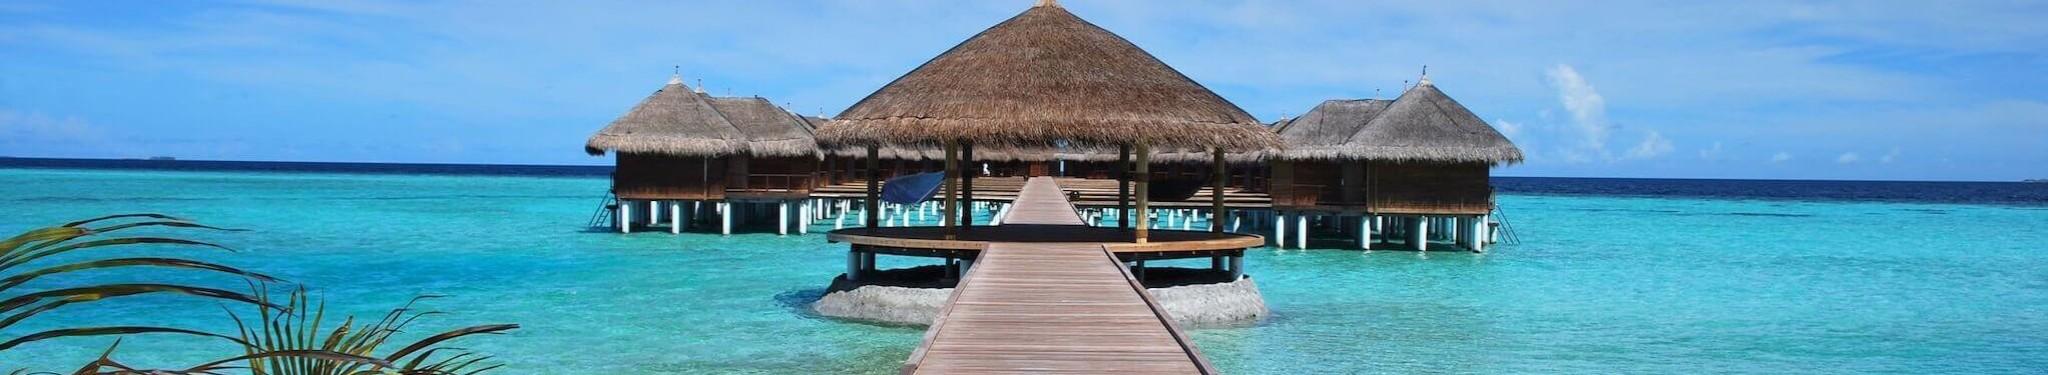 Luxury travel deals